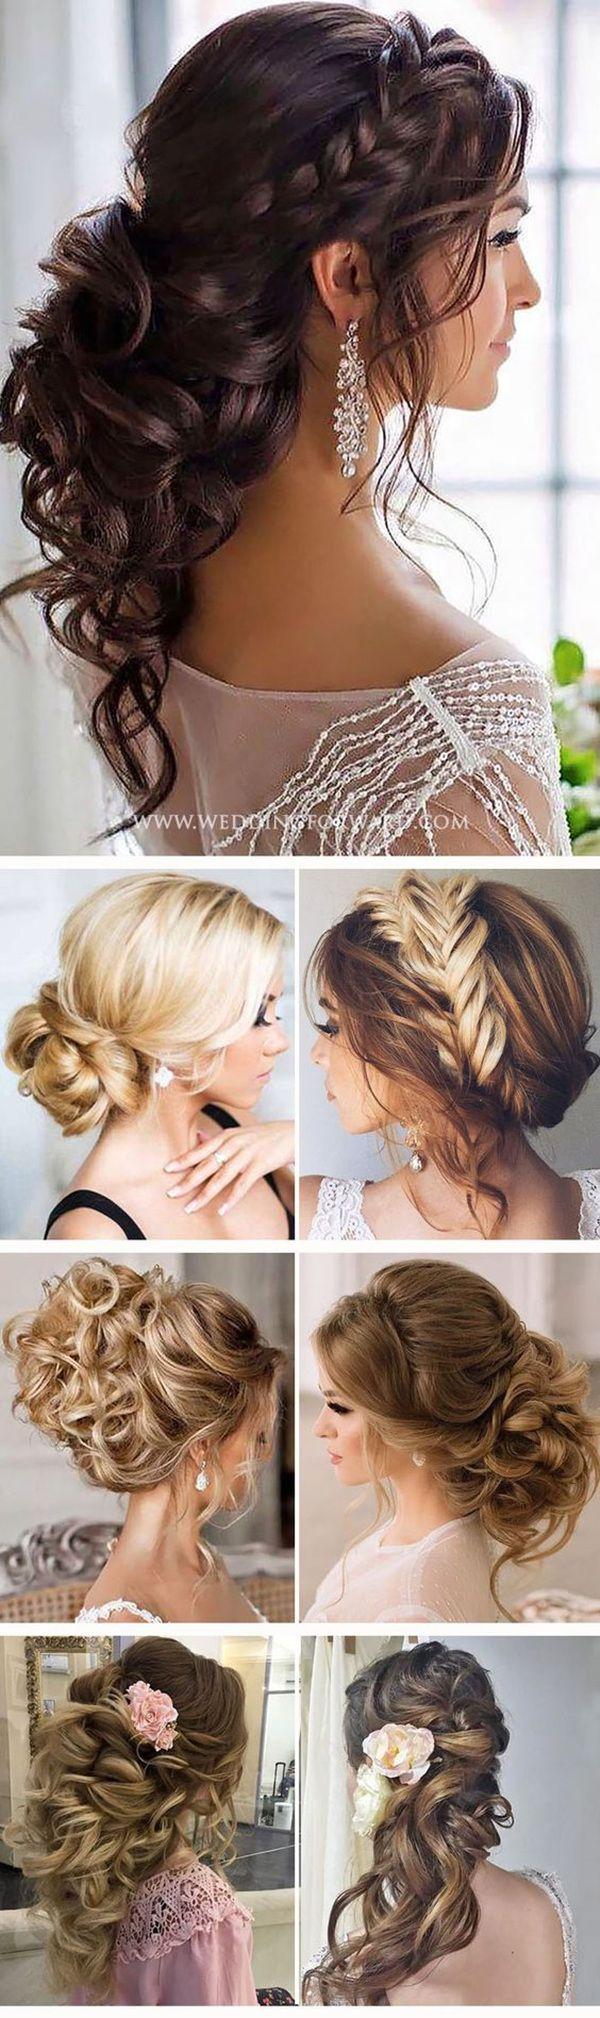 Best 25+ Bob wedding hairstyles ideas on Pinterest ...